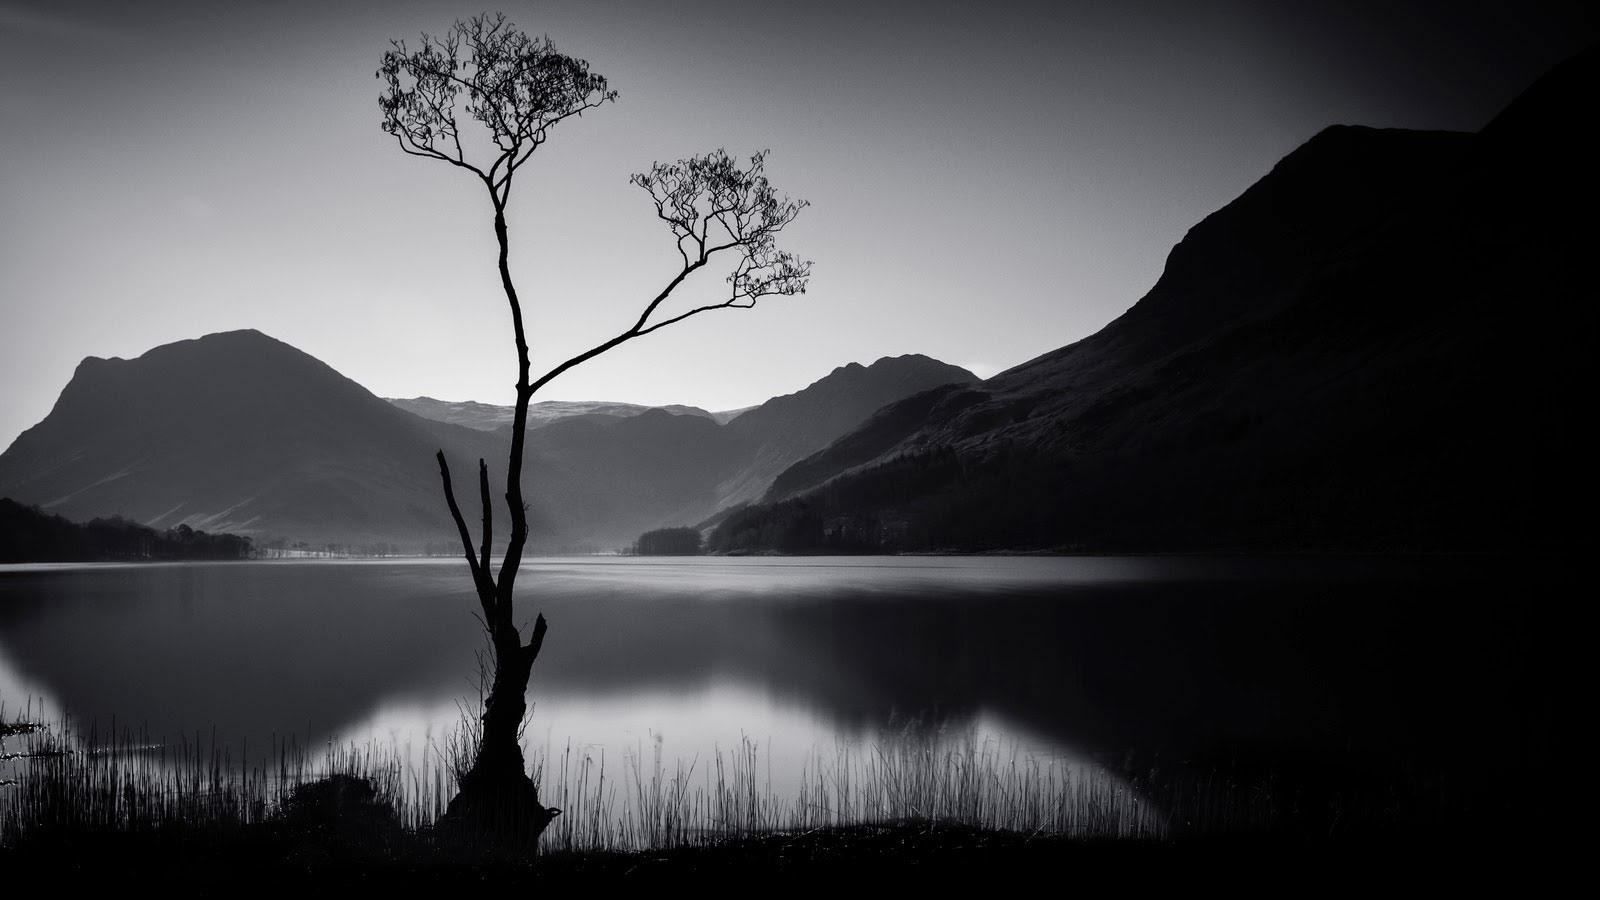 Buttermere, Lake District, UK chụp bởi PROmalcolm cooper